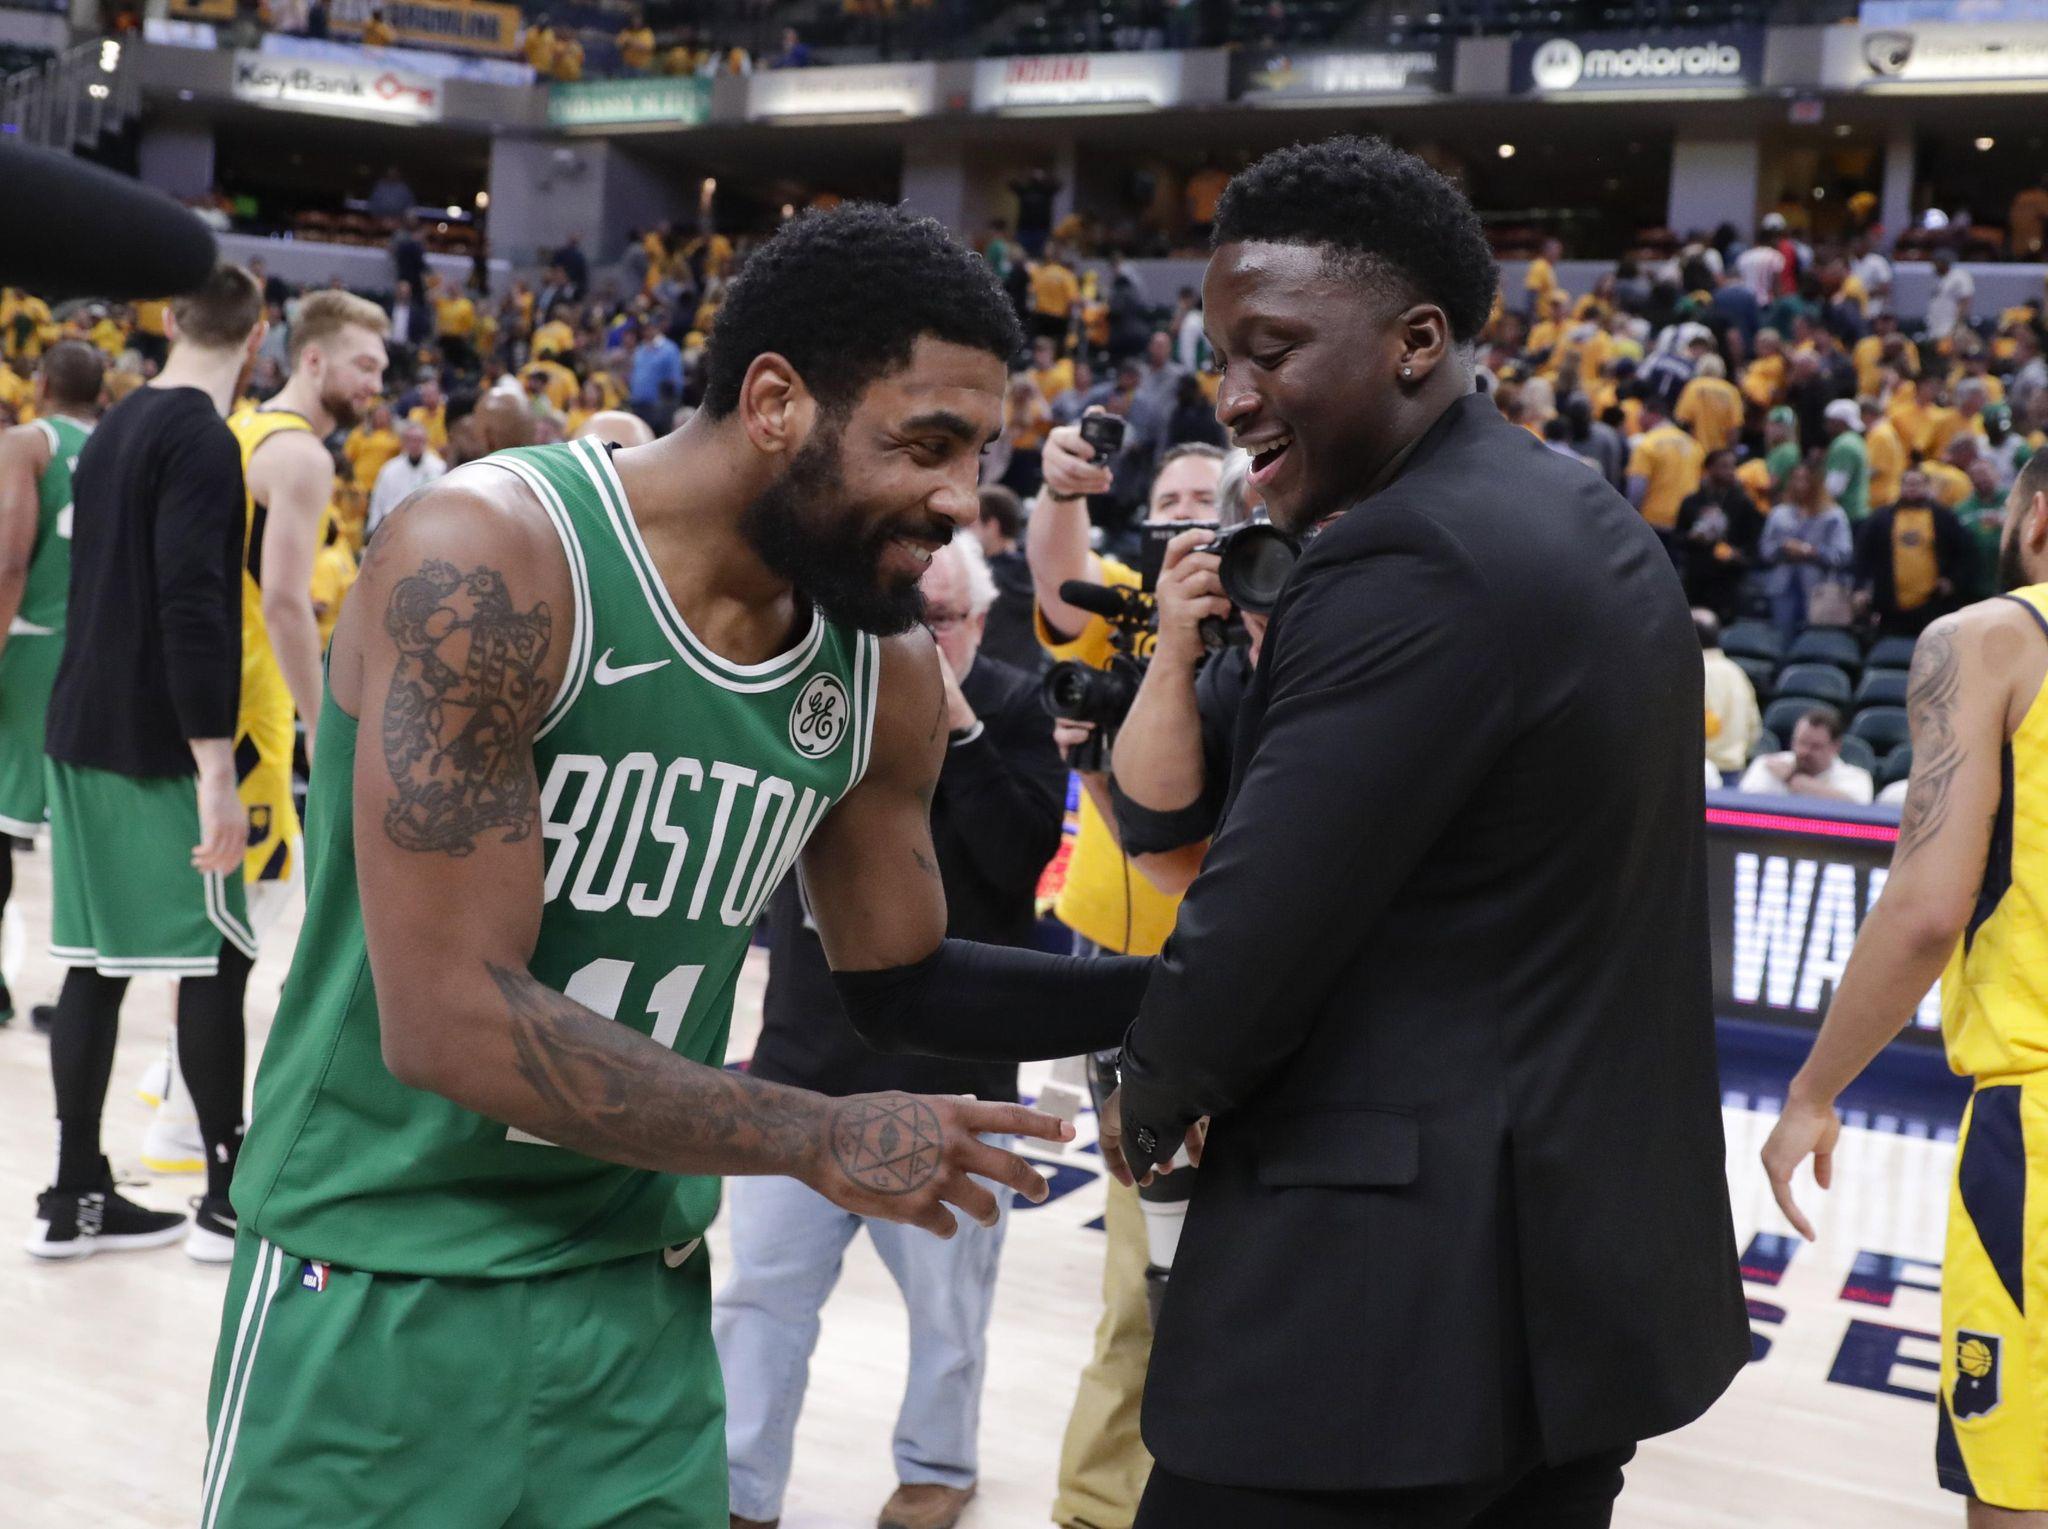 Celtics_pacers_basketball_41462_s2048x1529